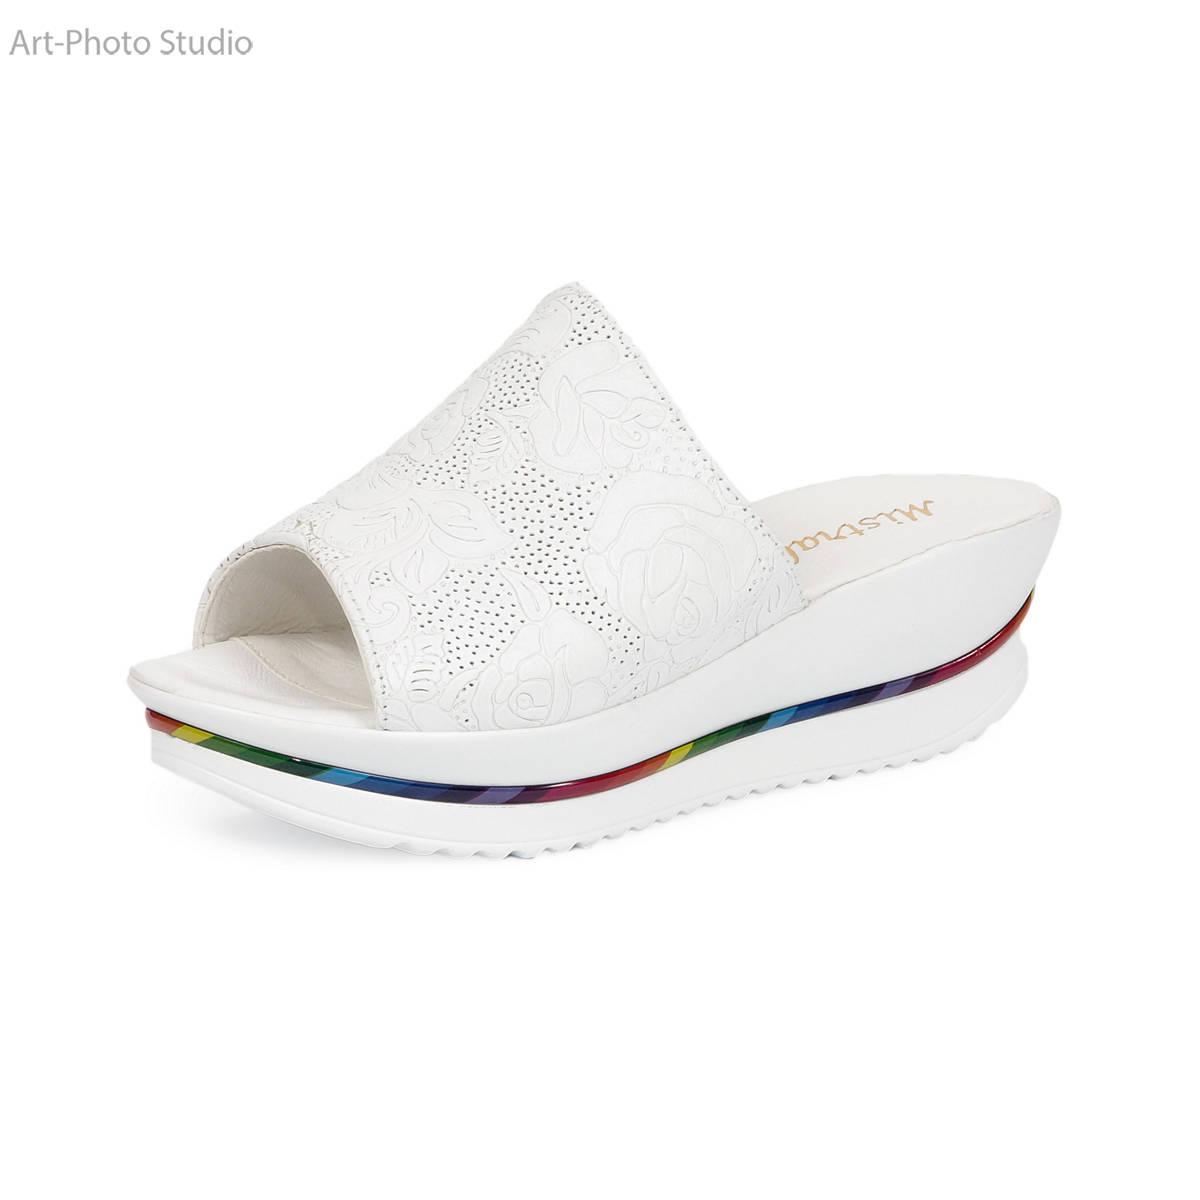 каталожная съемка обуви белого цвета